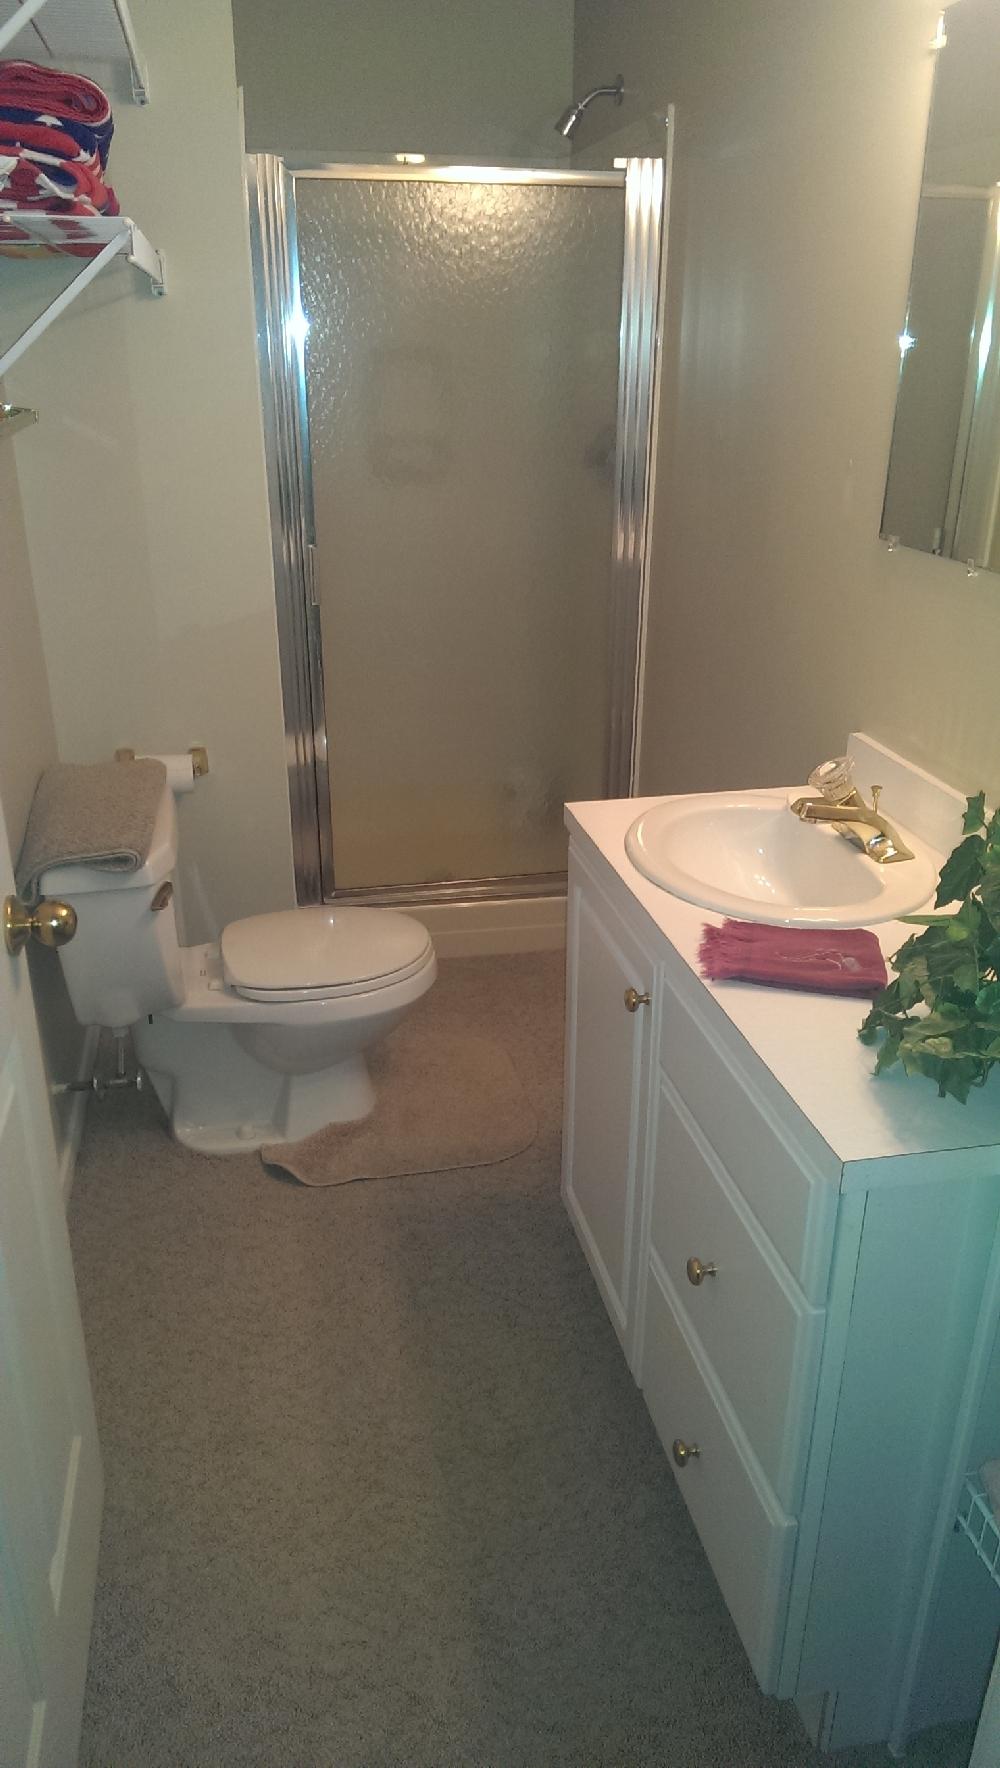 basement - bath and shower for living quarters